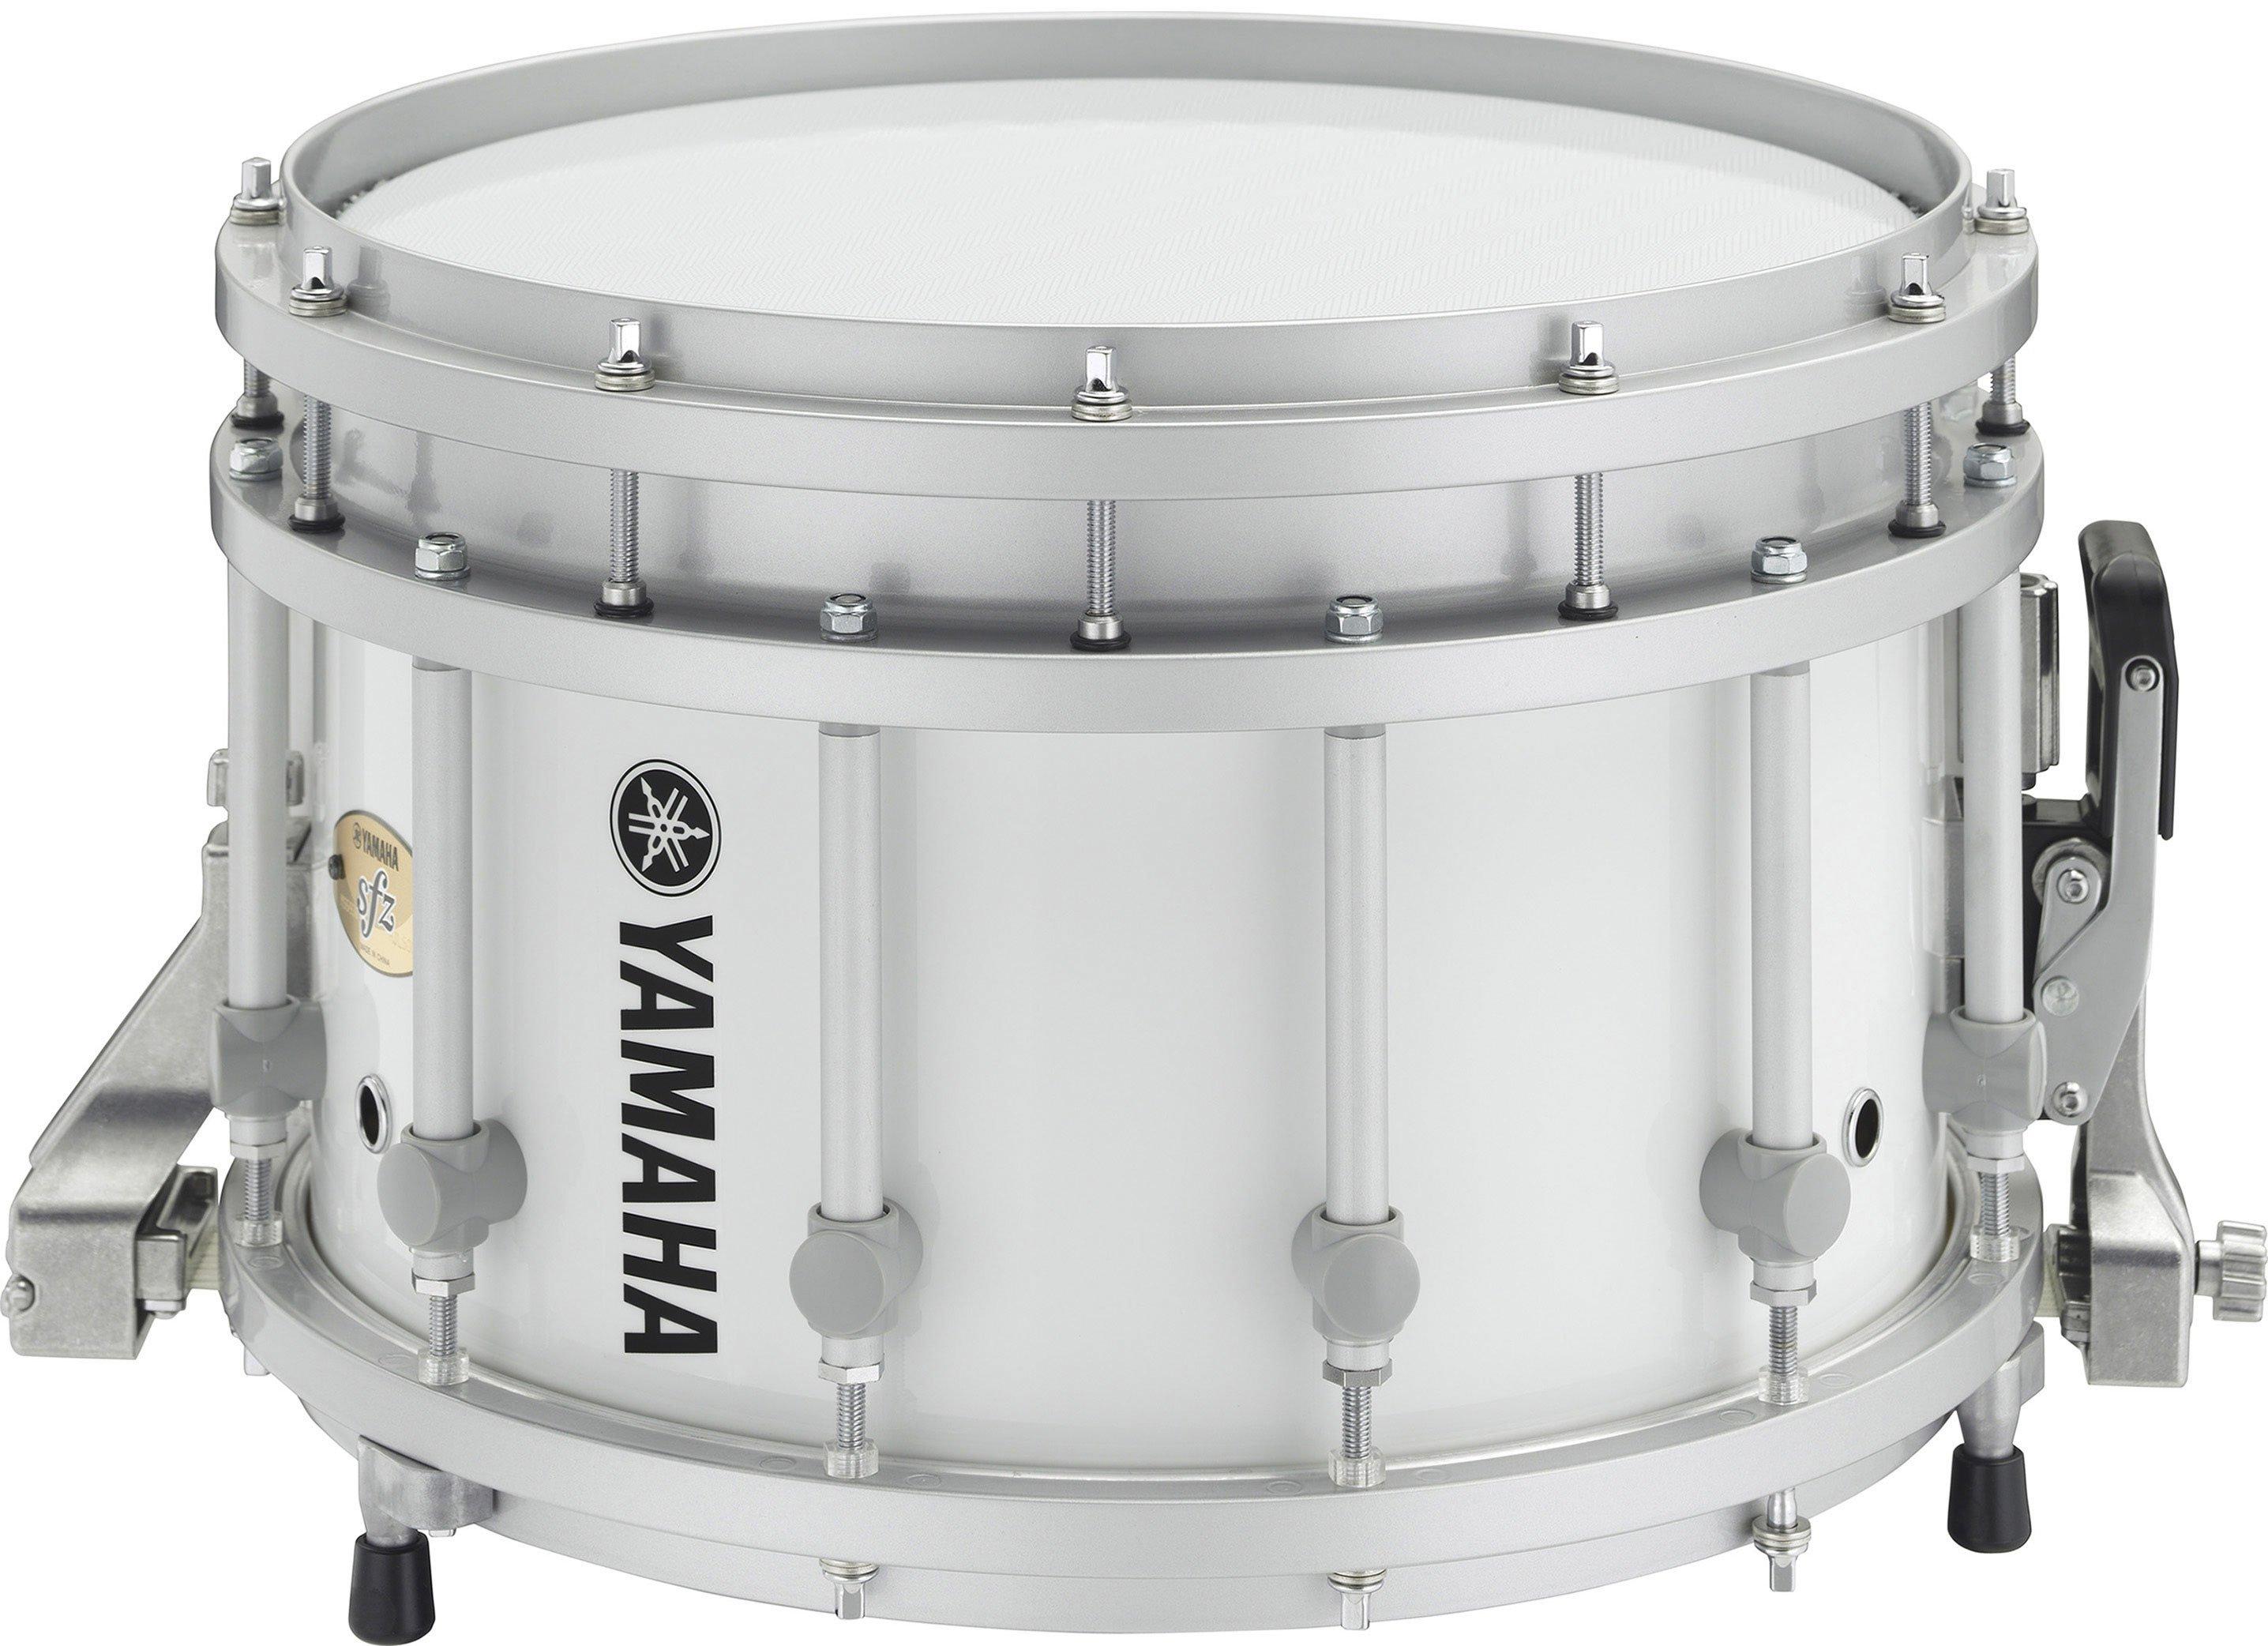 Yamaha Marching Drum Parts